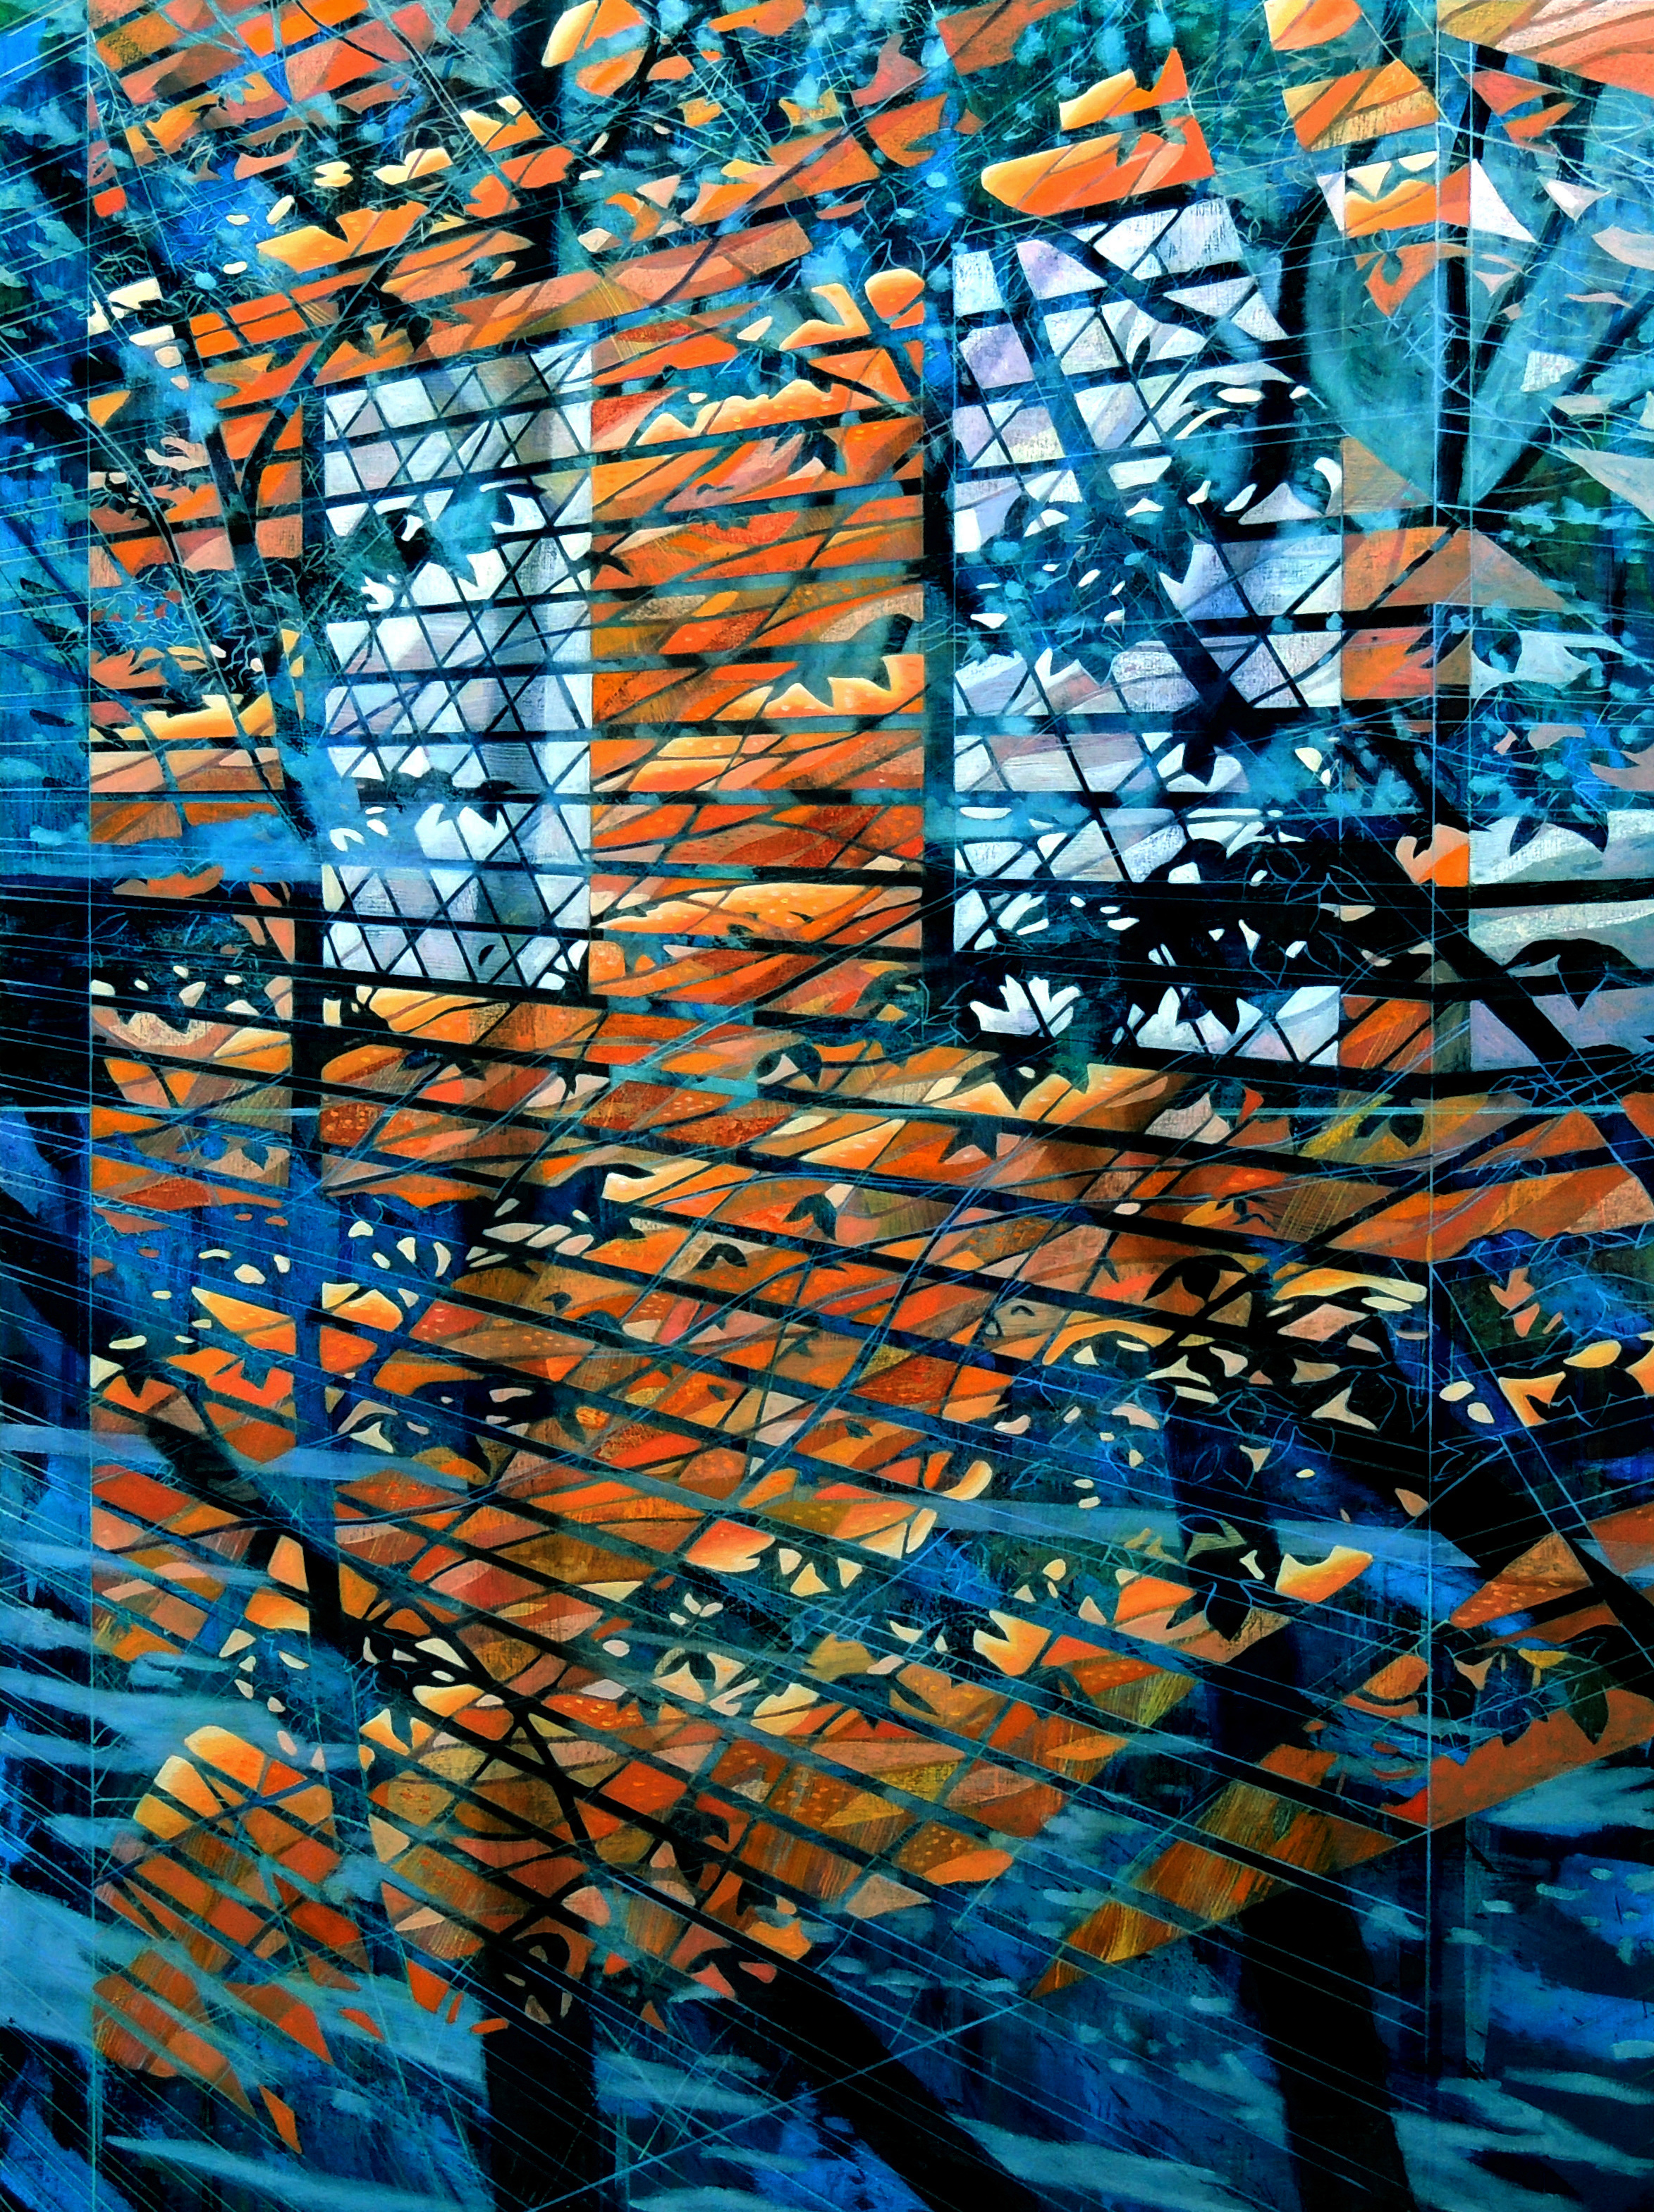 San Mateo Wall   48 x 36  Oil on Canvas  2014